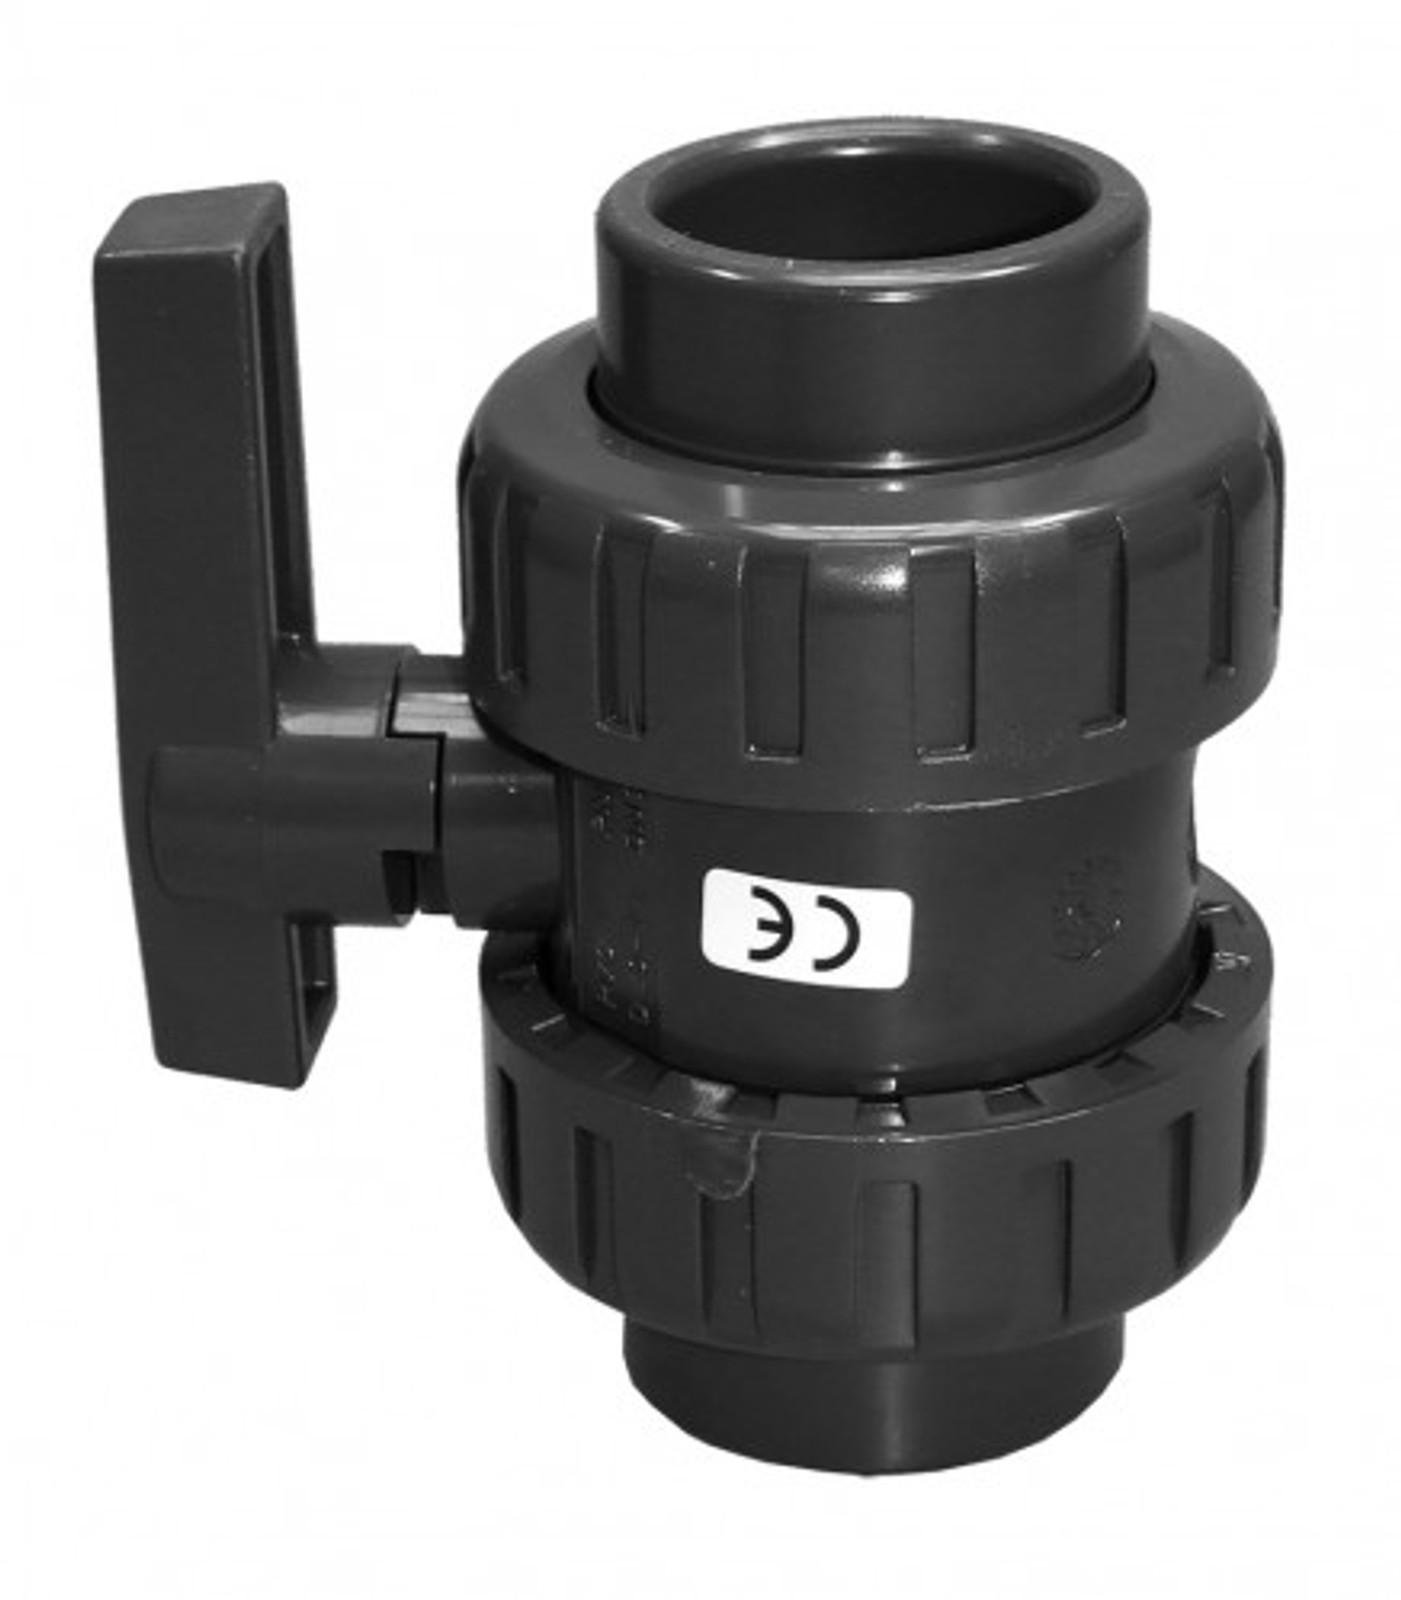 PVC-Kugelhahn m. 2 Anschlußenden, Ø 63 mm